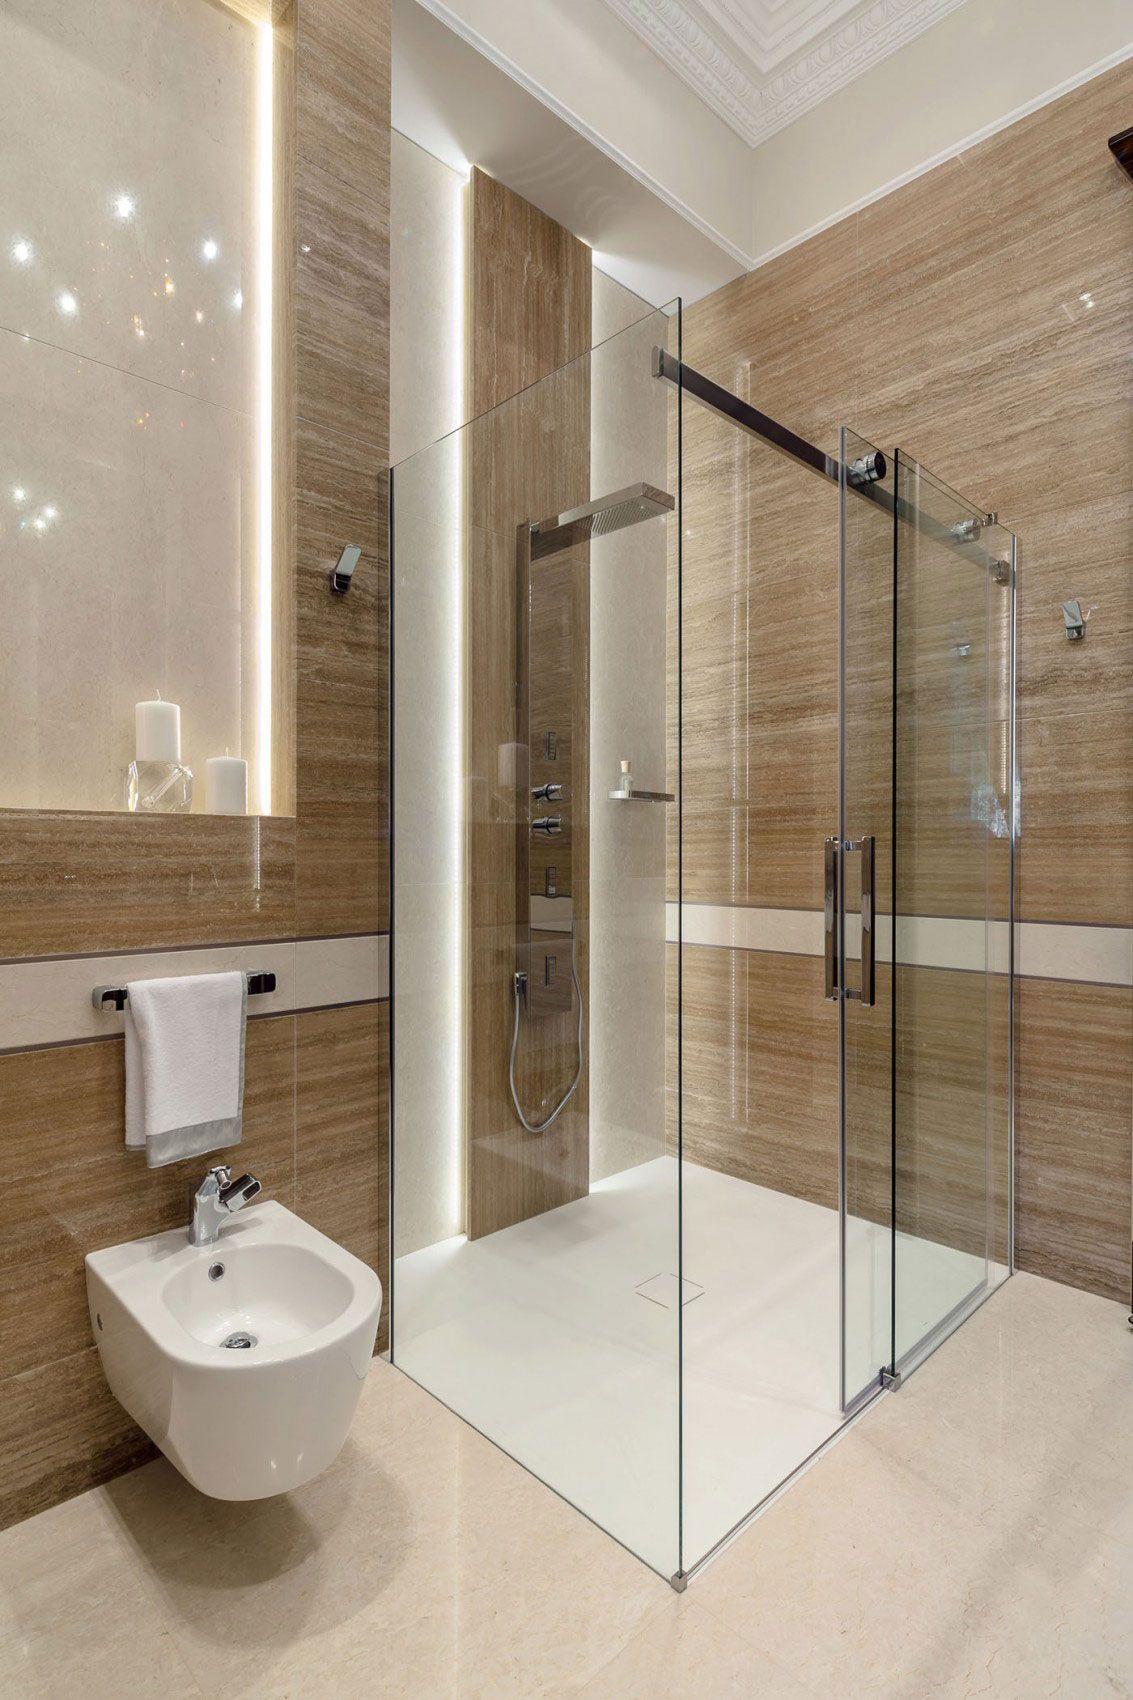 Chic apartment interior design created by ng studio for Diseno de banos lujosos